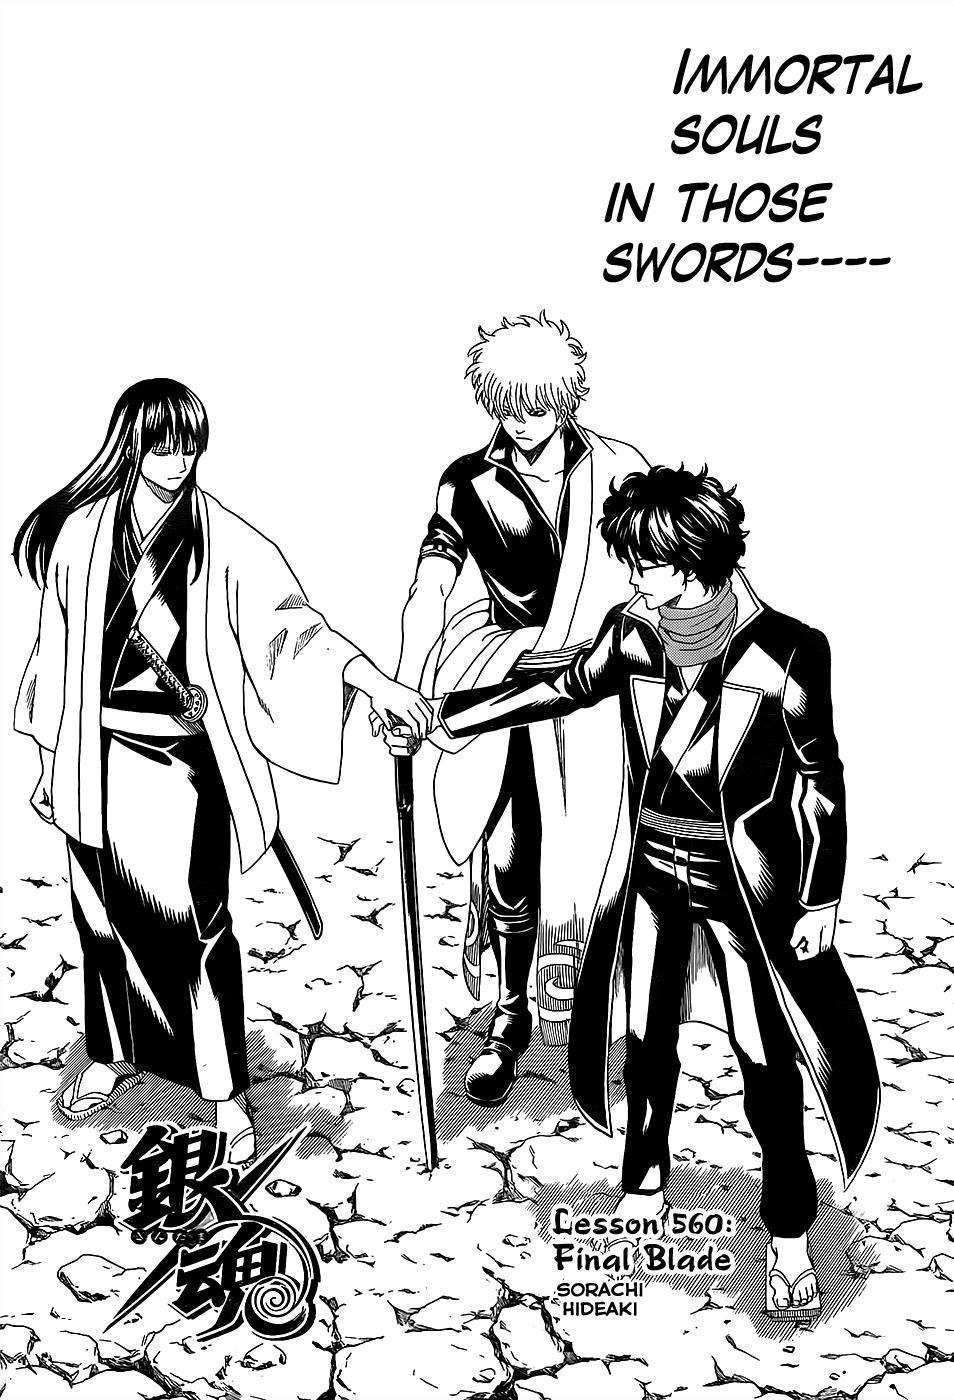 Gintama Chapter 560(画像あり) 坂本辰馬, 高杉晋助, 四天王